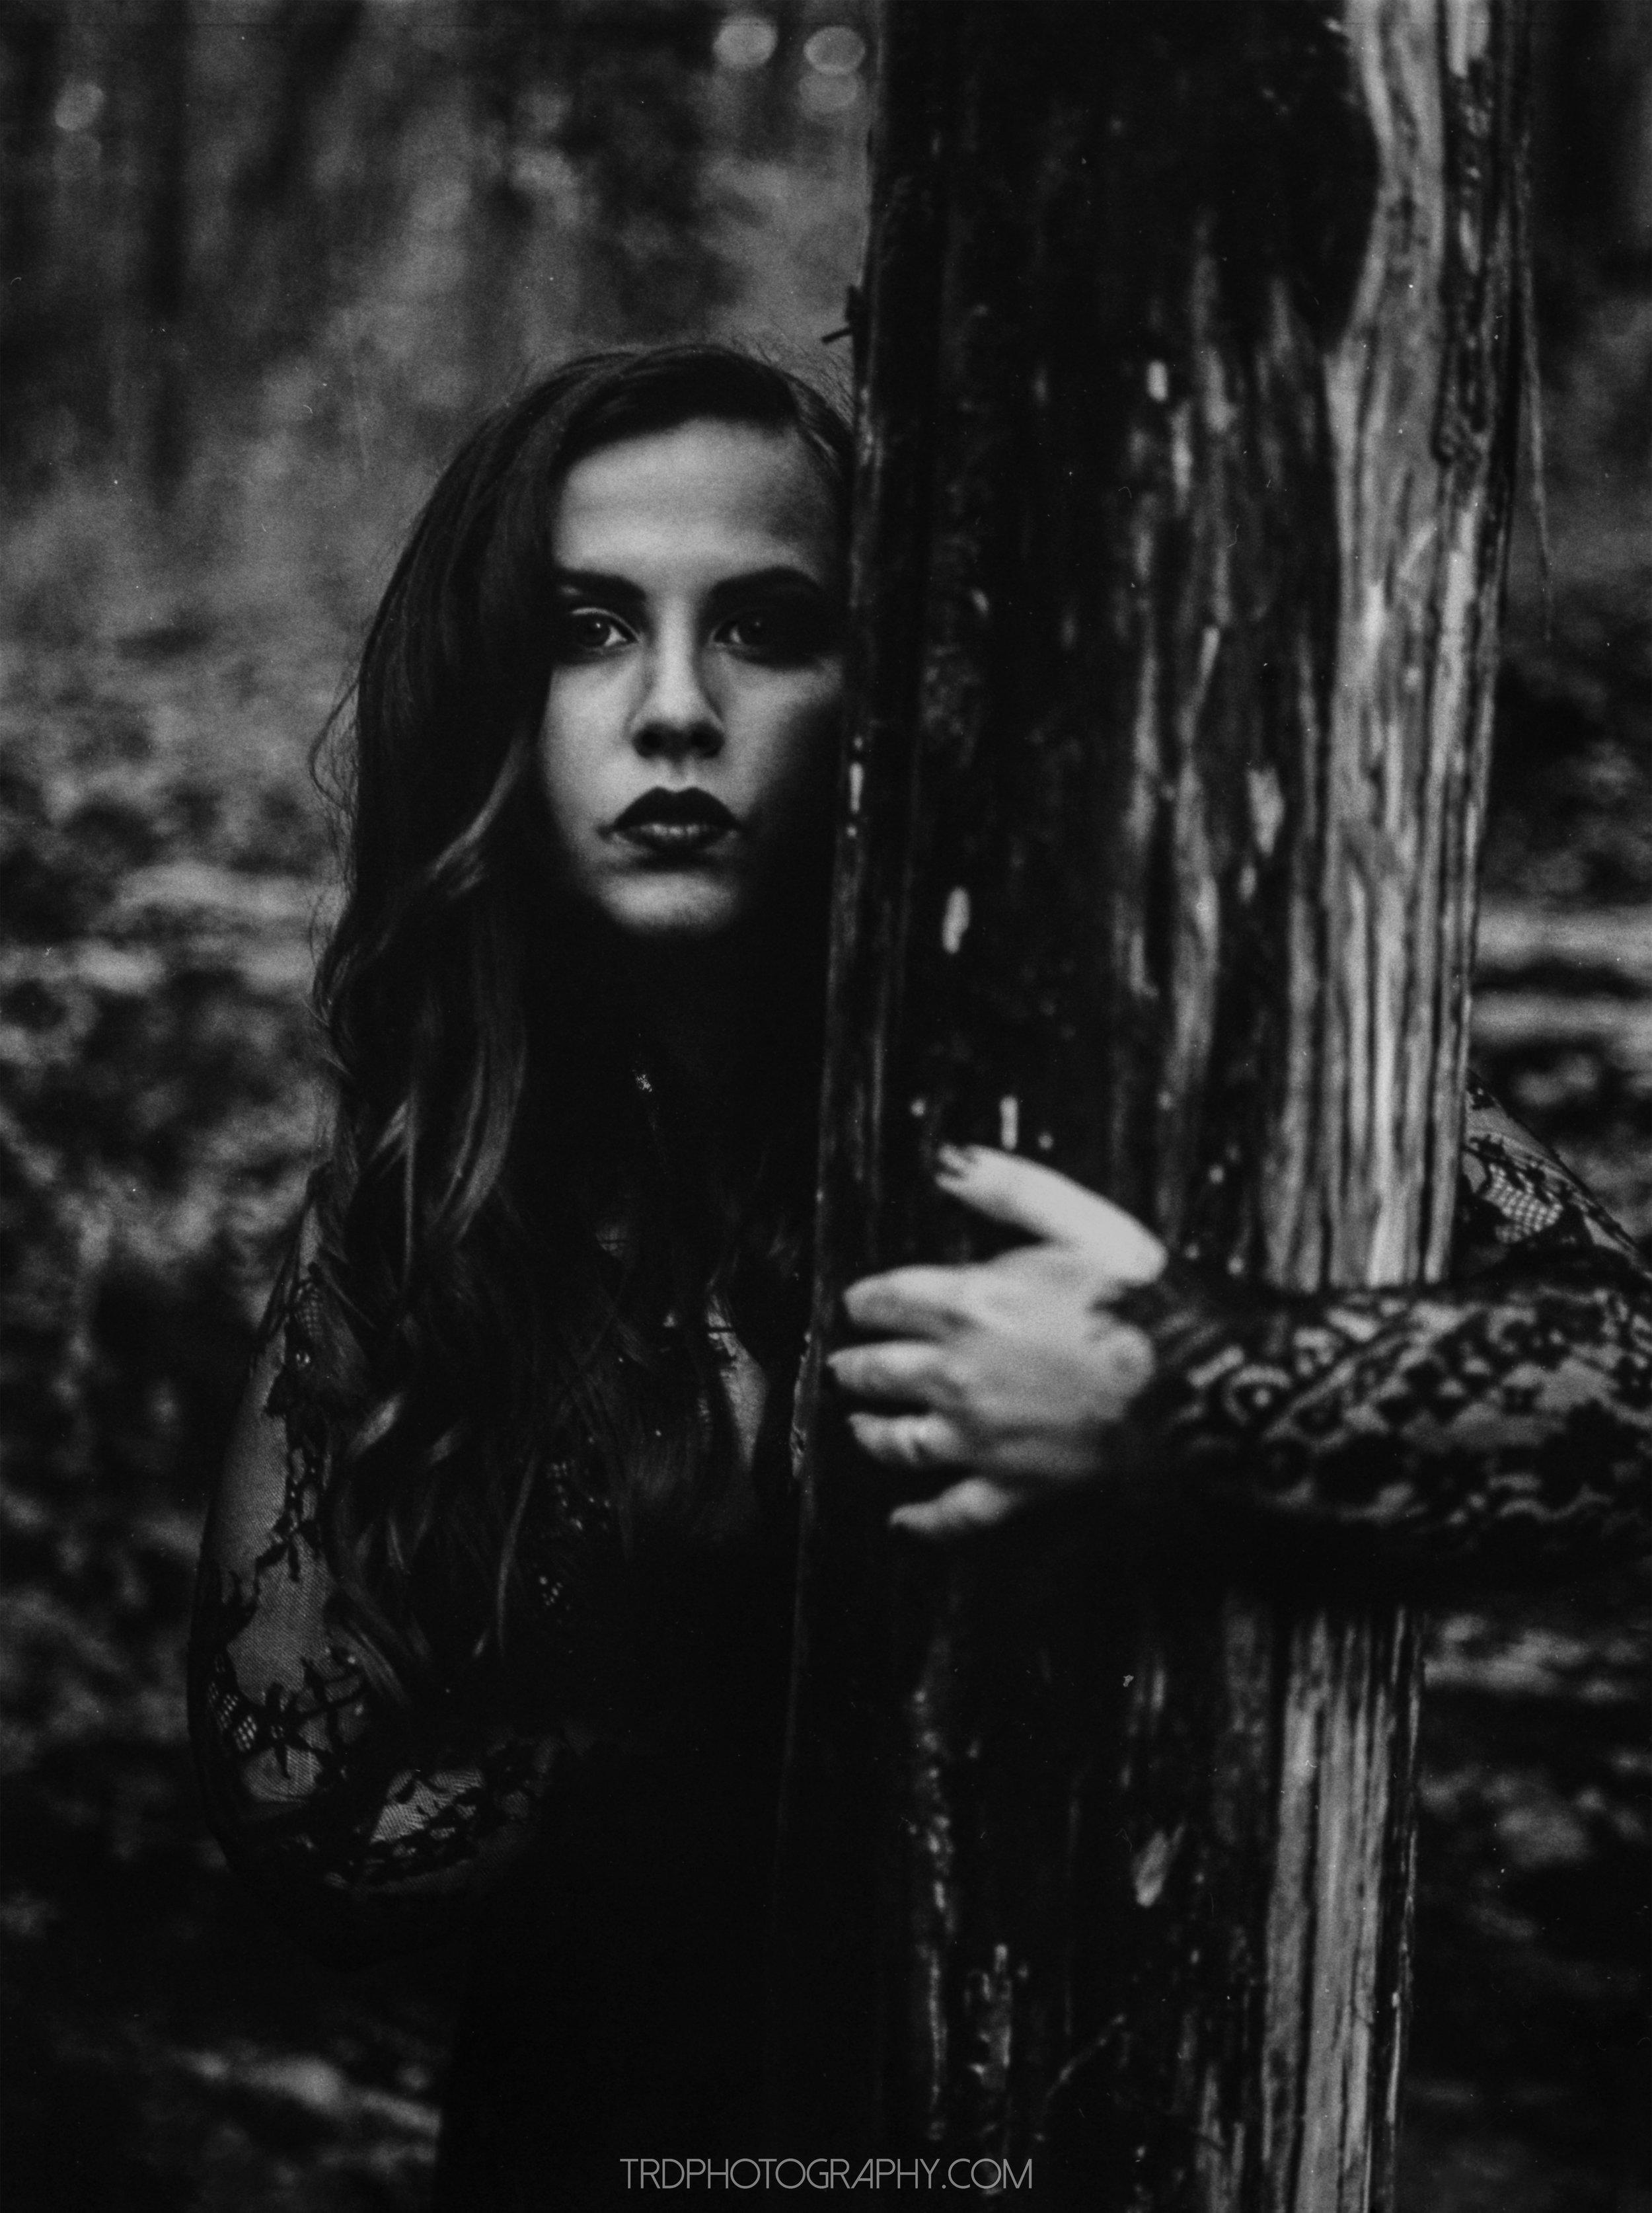 Emily Northrip - Kodak Tri X - TRD Photography